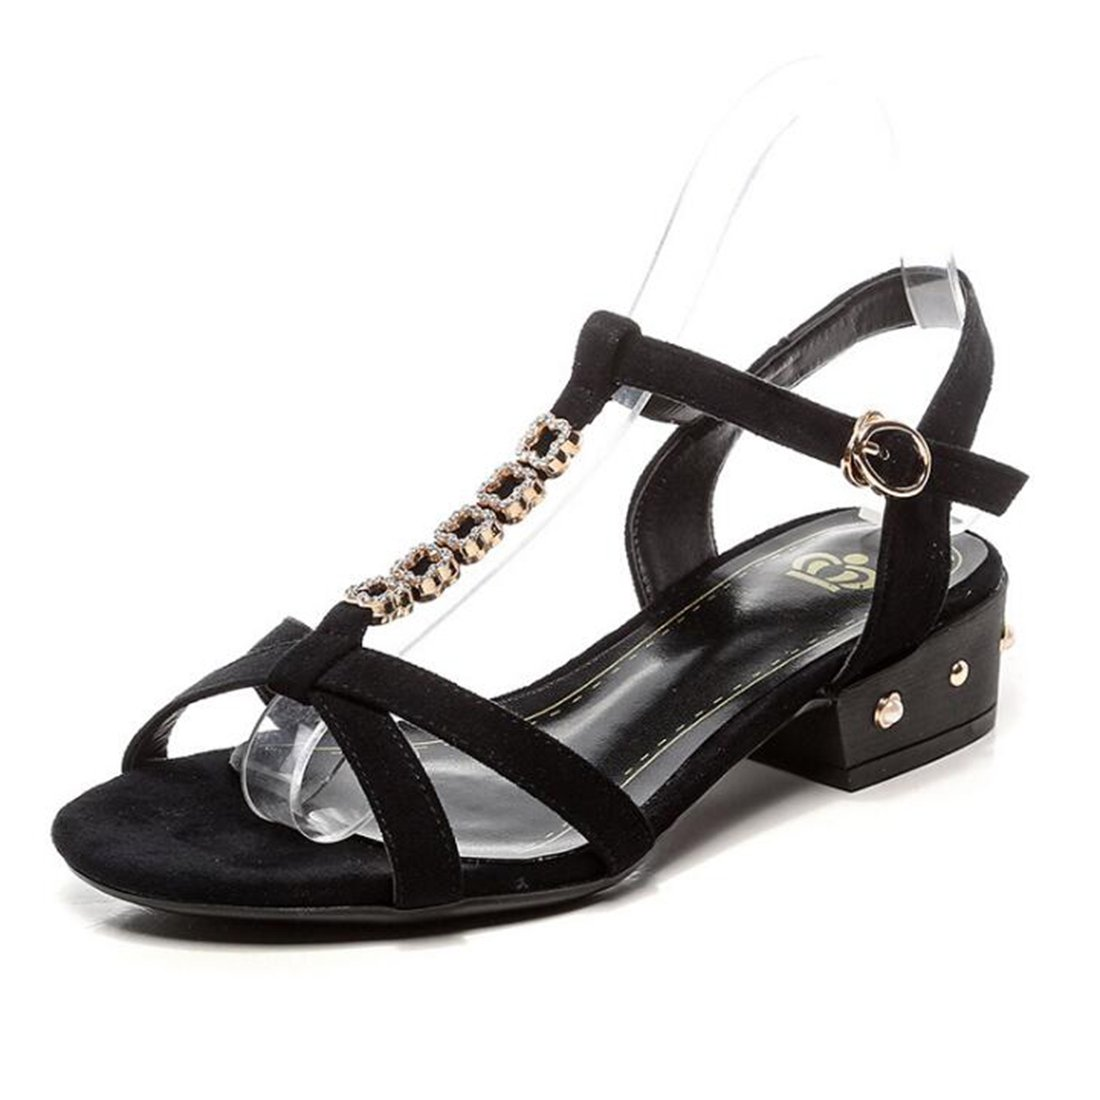 ZHONGST Frauen Sommer Strass Sandalen Casual Mode Wort Schnalle Sandalen  40 Black